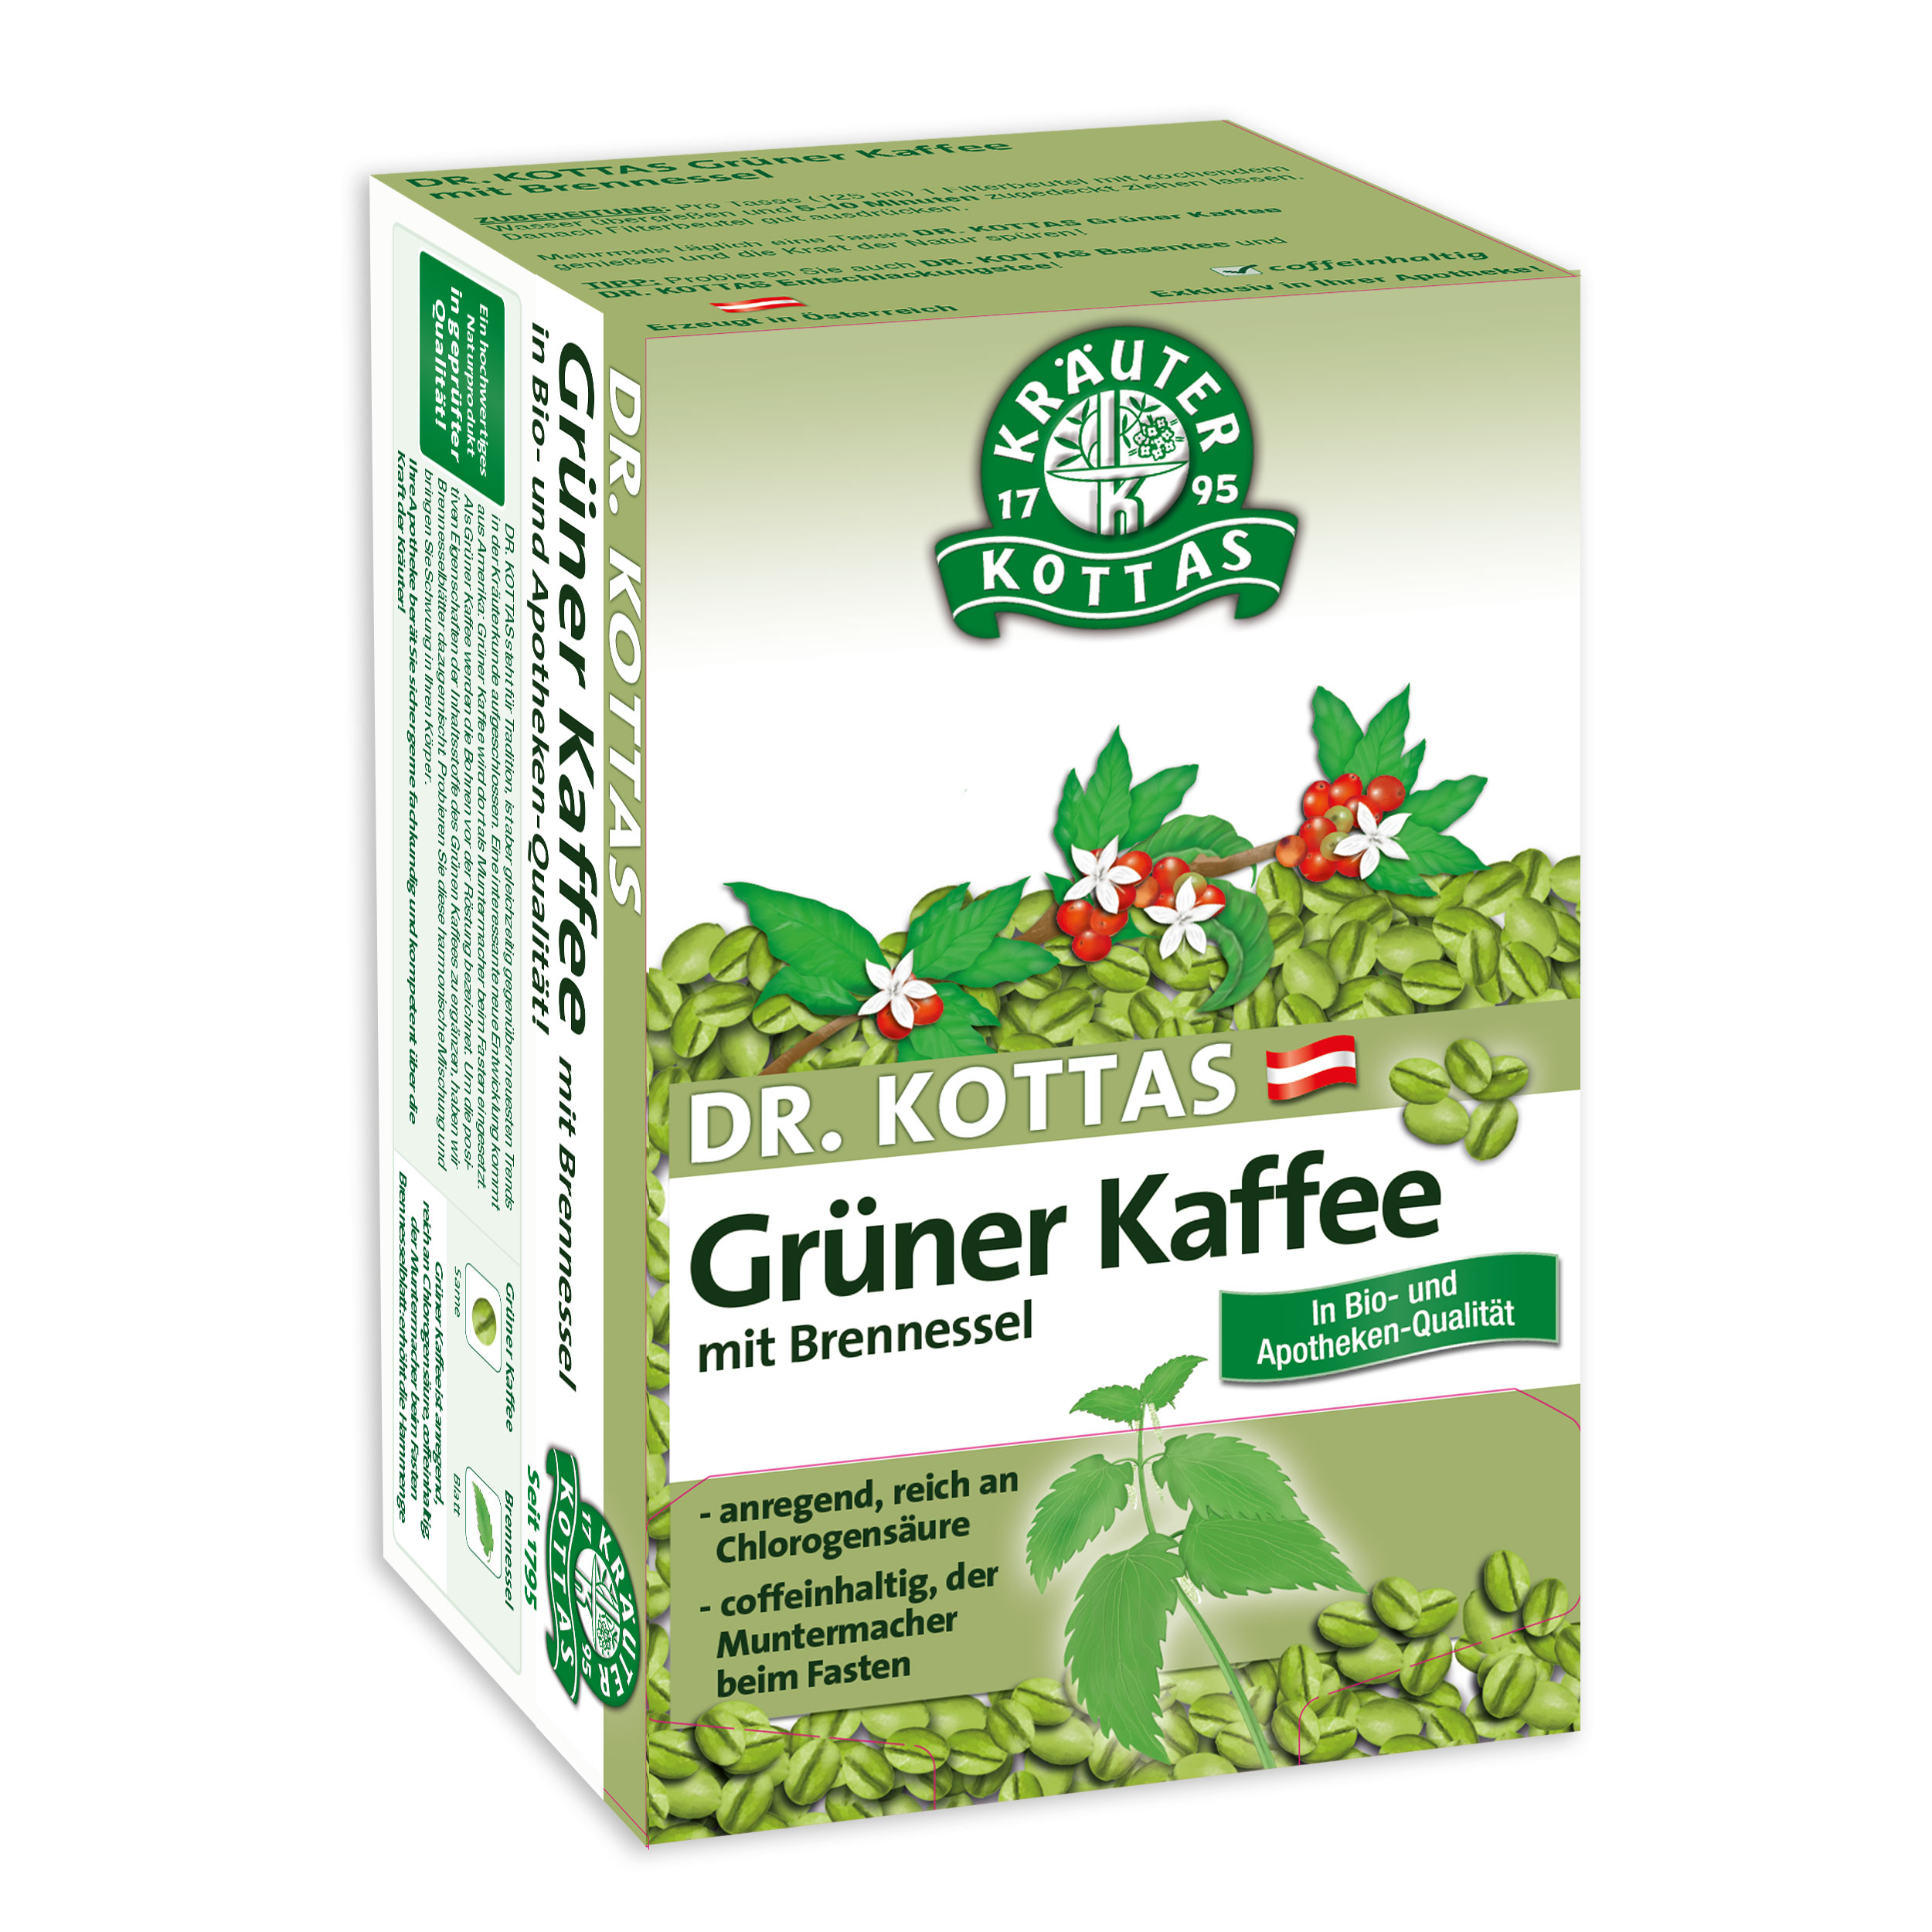 Grüner Kaffee Mit Ingwer dr kottas grüner kaffee mit brennessel